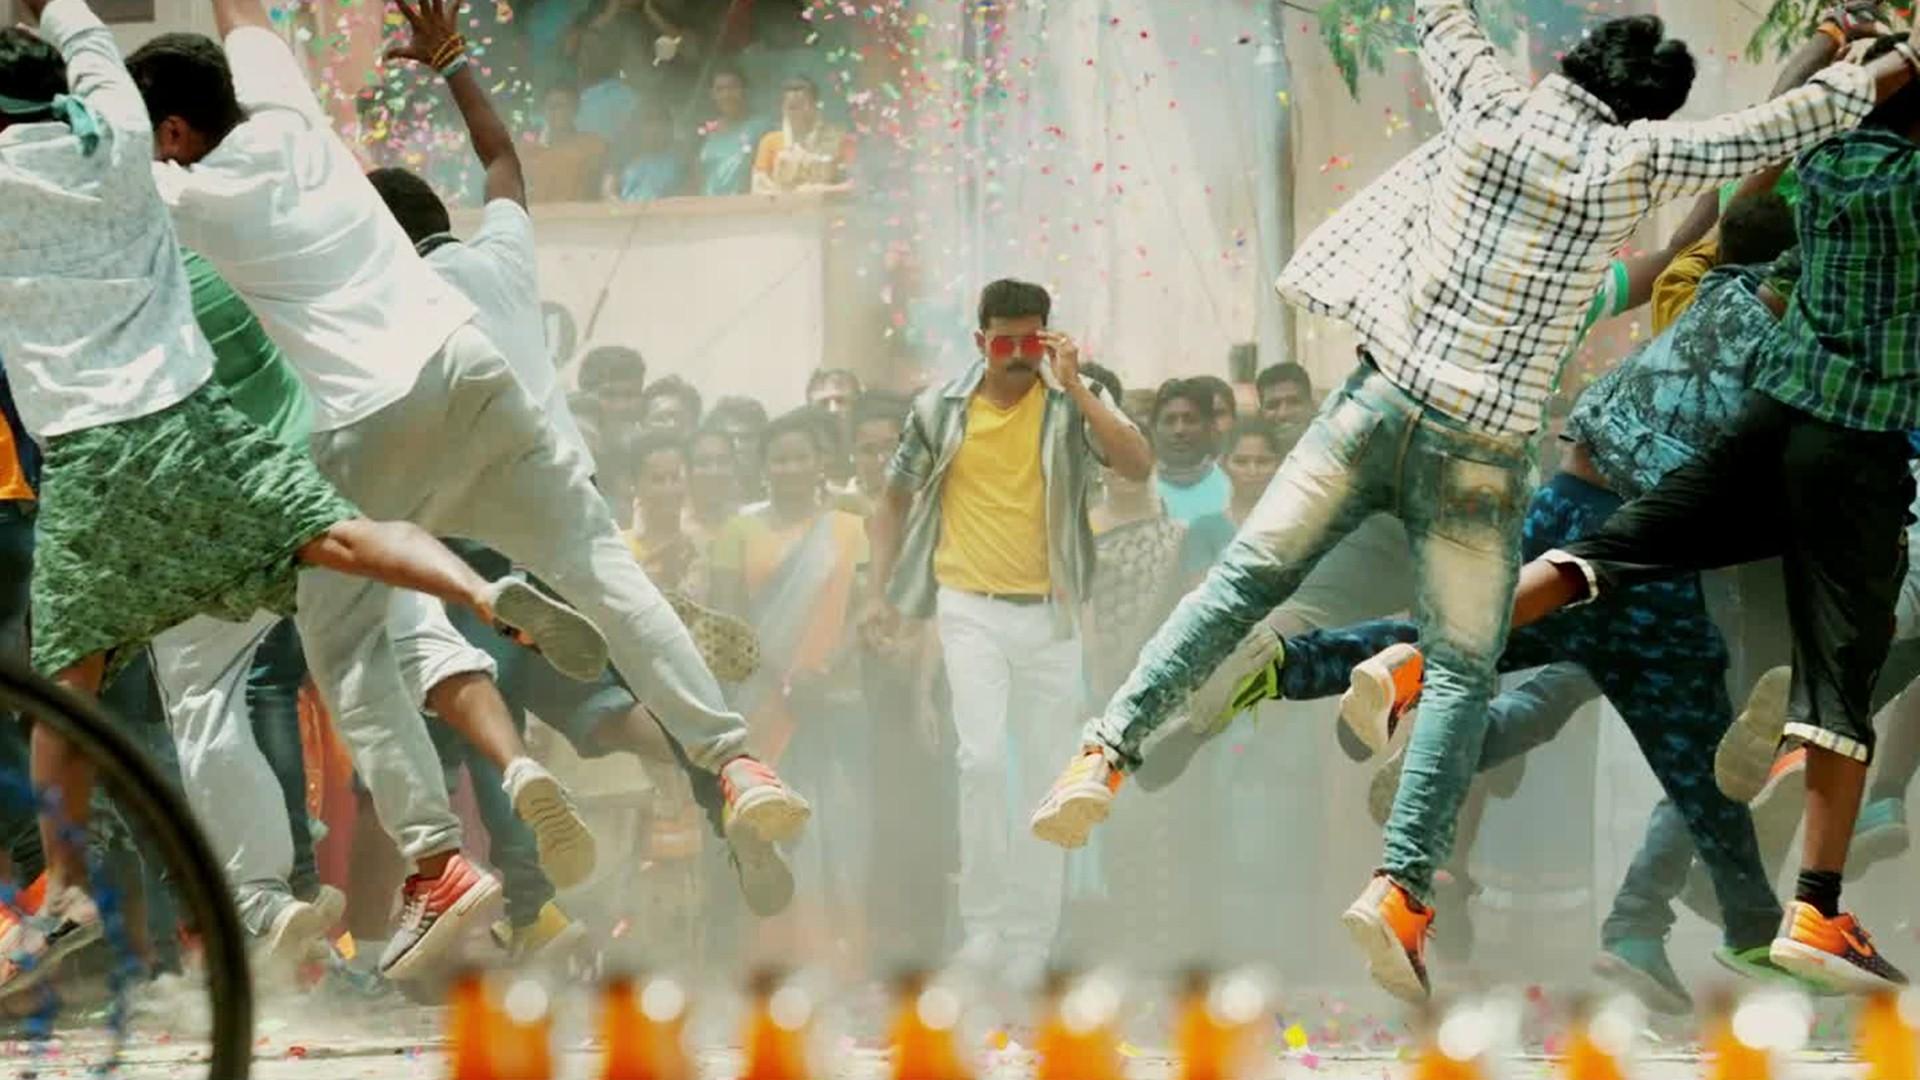 Vijay Mersal Best Wallpaper Tamil Movie Fight Background 148980 Hd Wallpaper Backgrounds Download